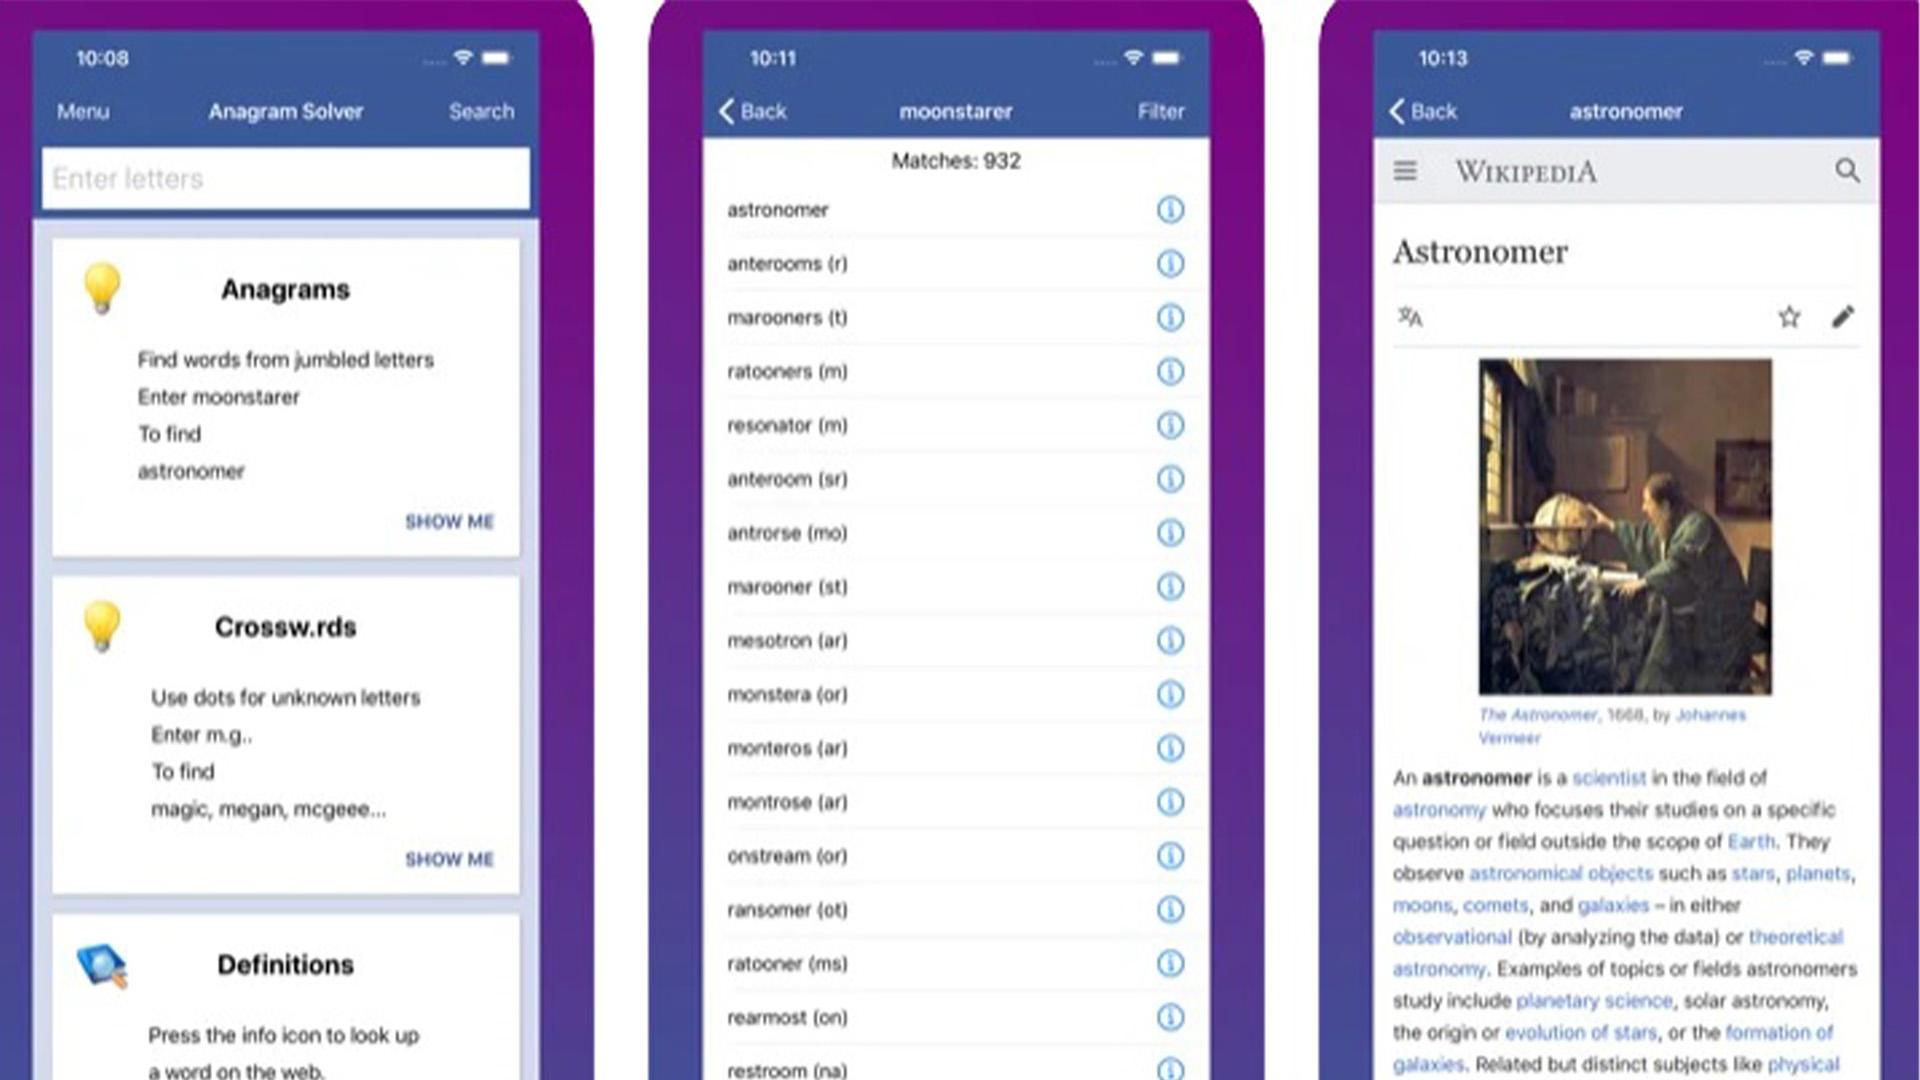 Anagram solver iOS screenshot 2020